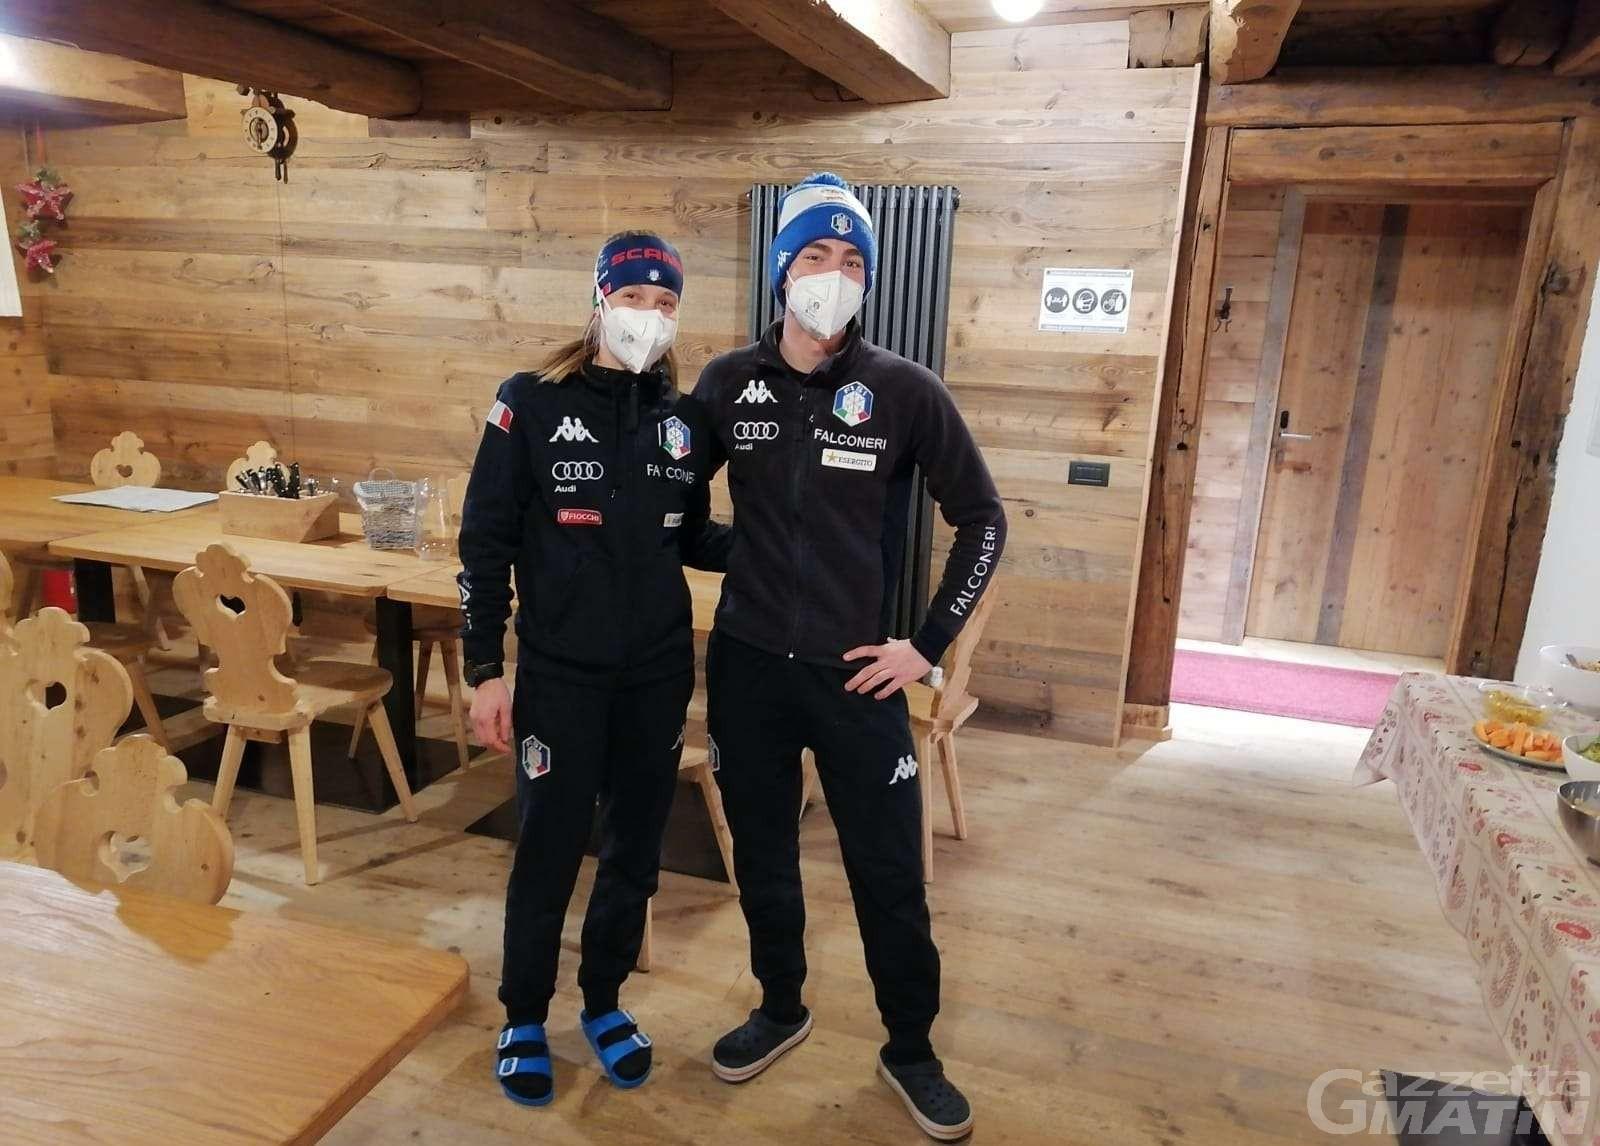 Biathlon: Didier Bionaz e Michela Carrara qualificati per l'inseguimento